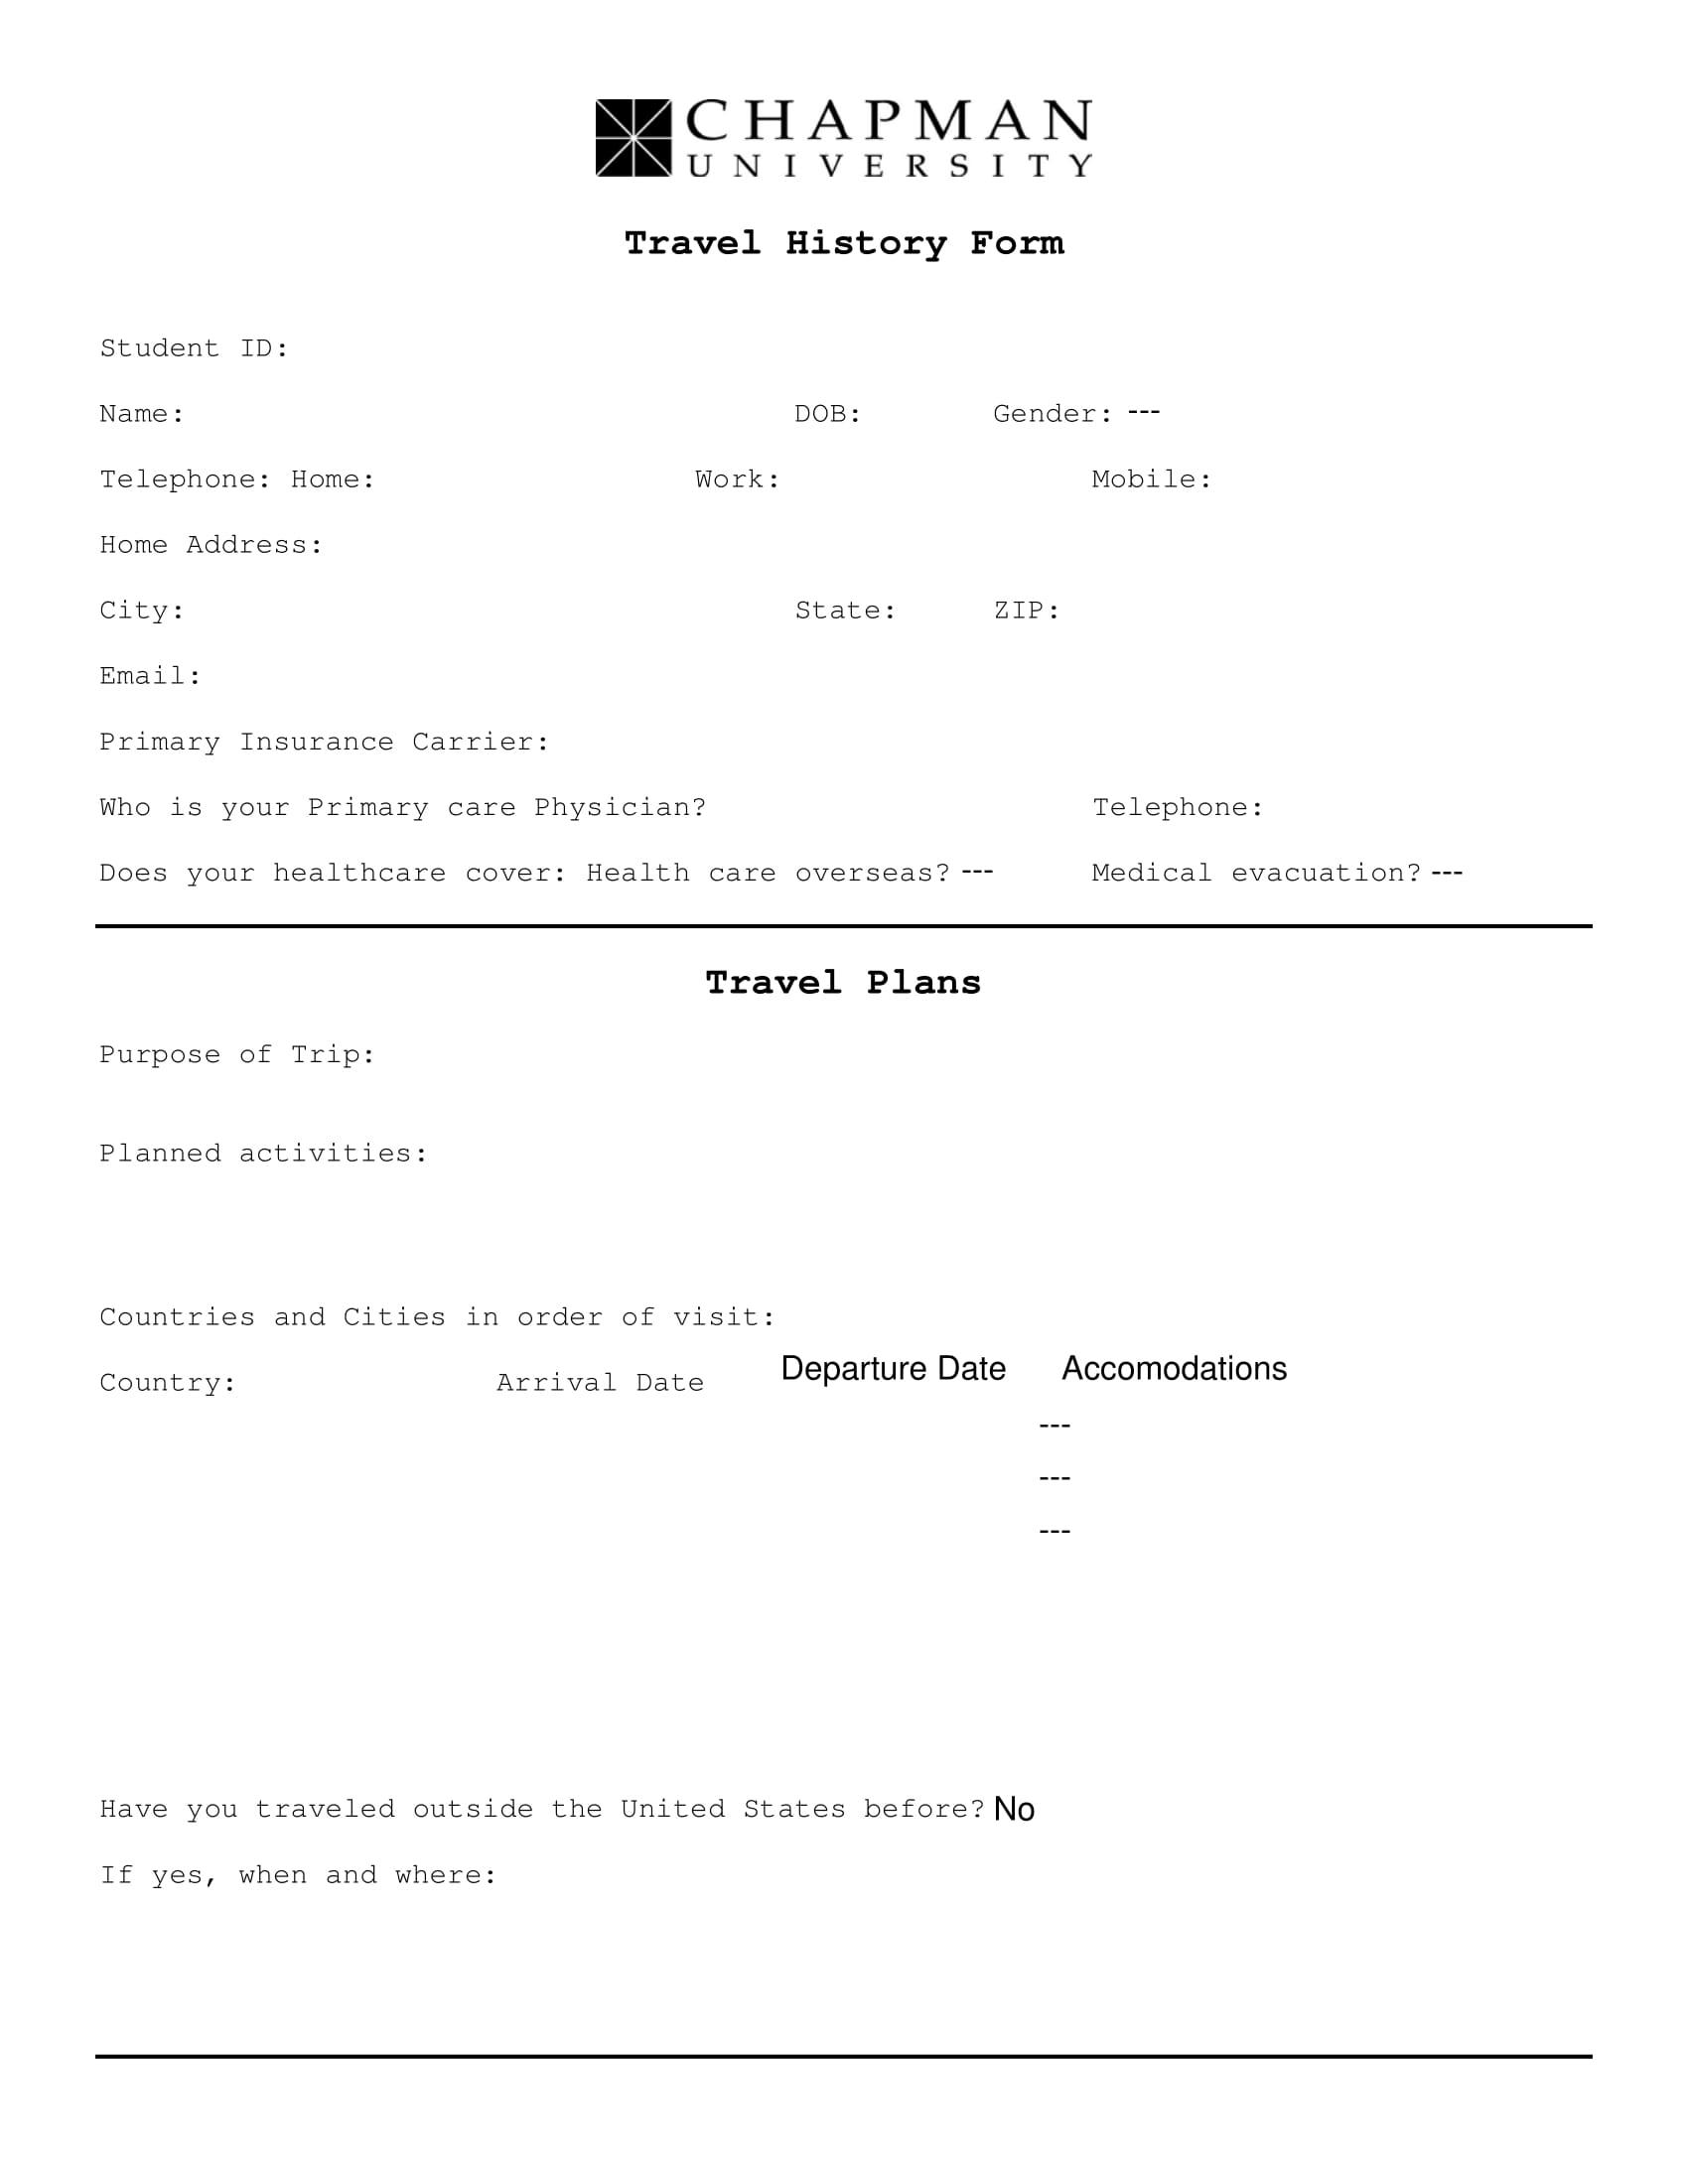 student travel history form 1